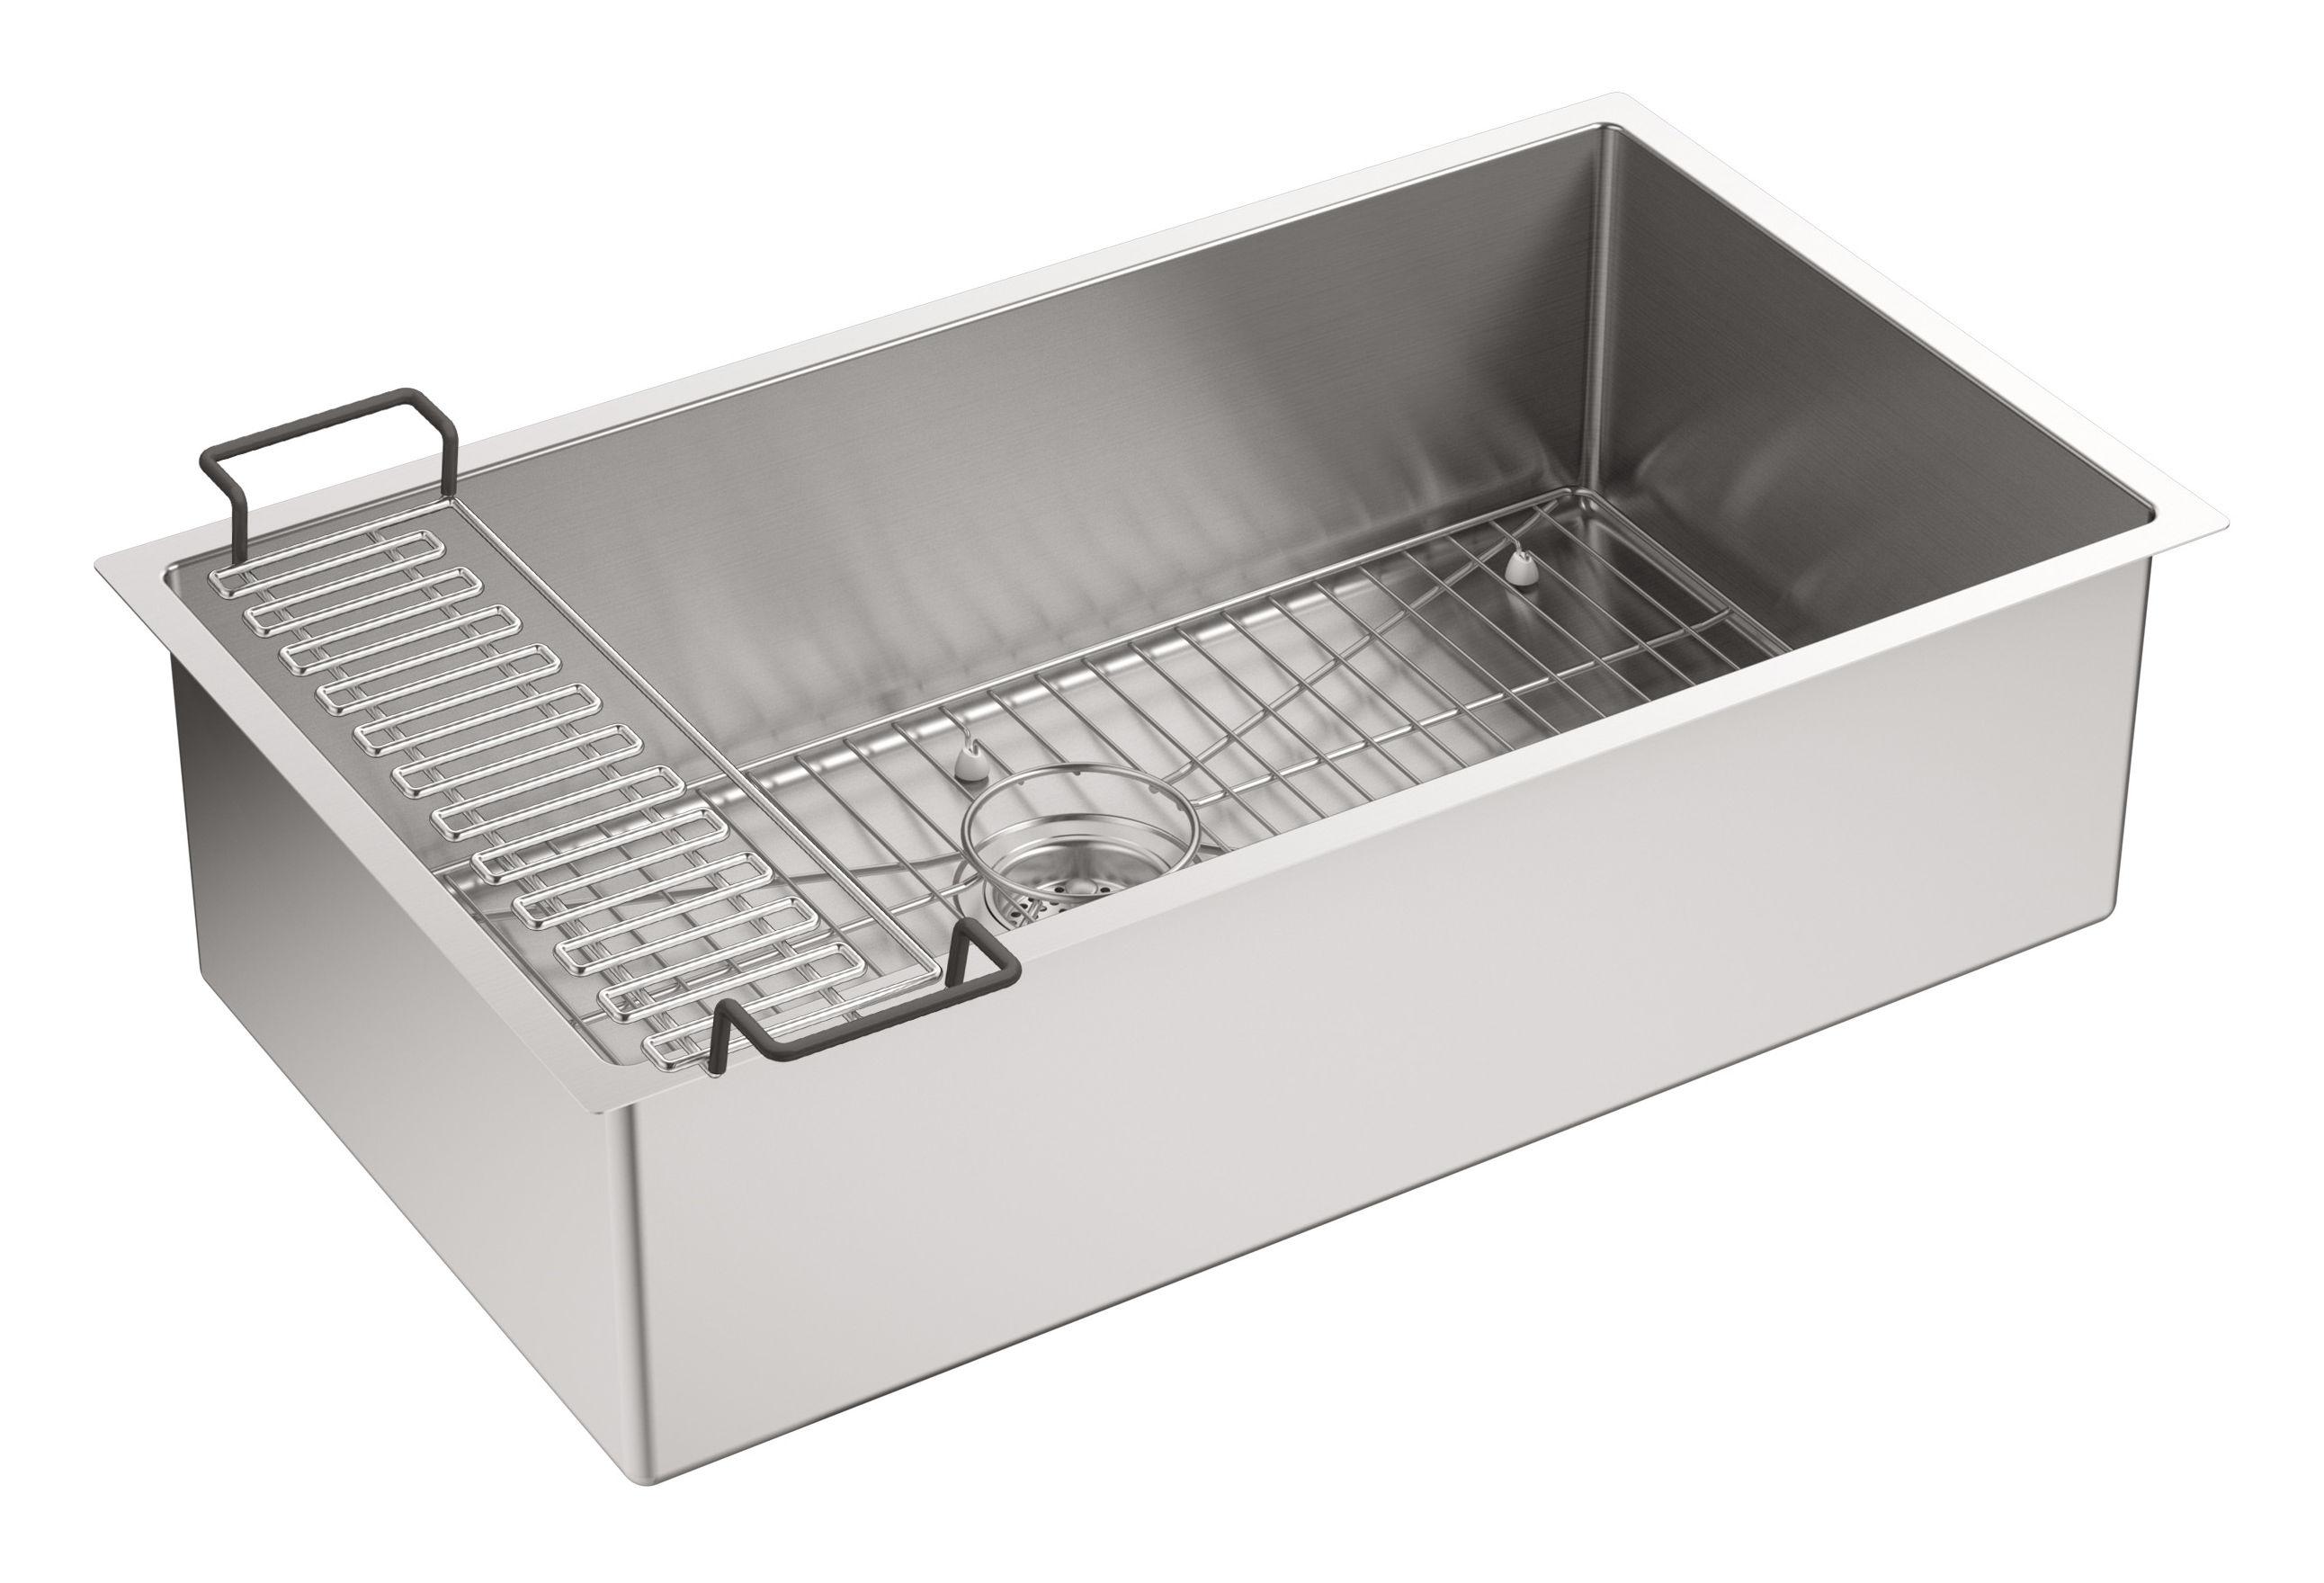 Kohler Stainless Steel Kitchen Sinks kohler k-5285 kitchen sink - build